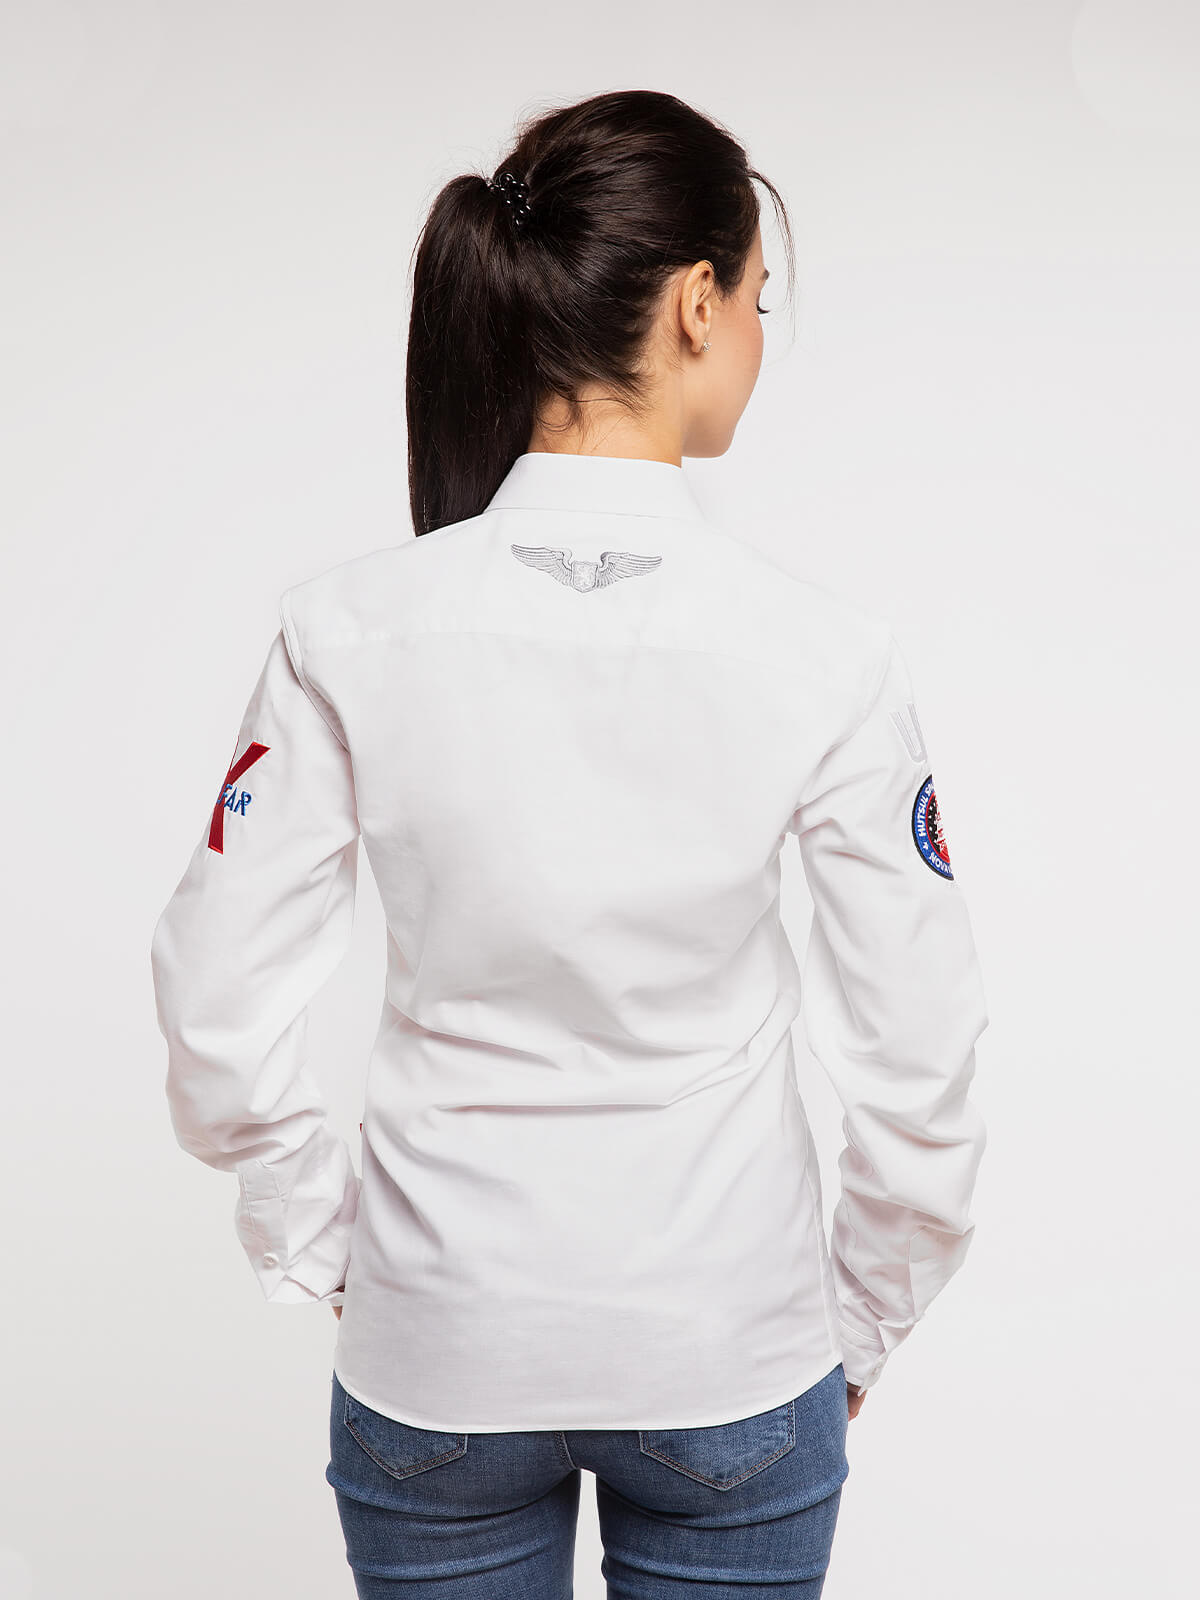 Women's Shirt Molfar-X. Color white.  Technique of prints applied: embroidery, silkscreen printing.